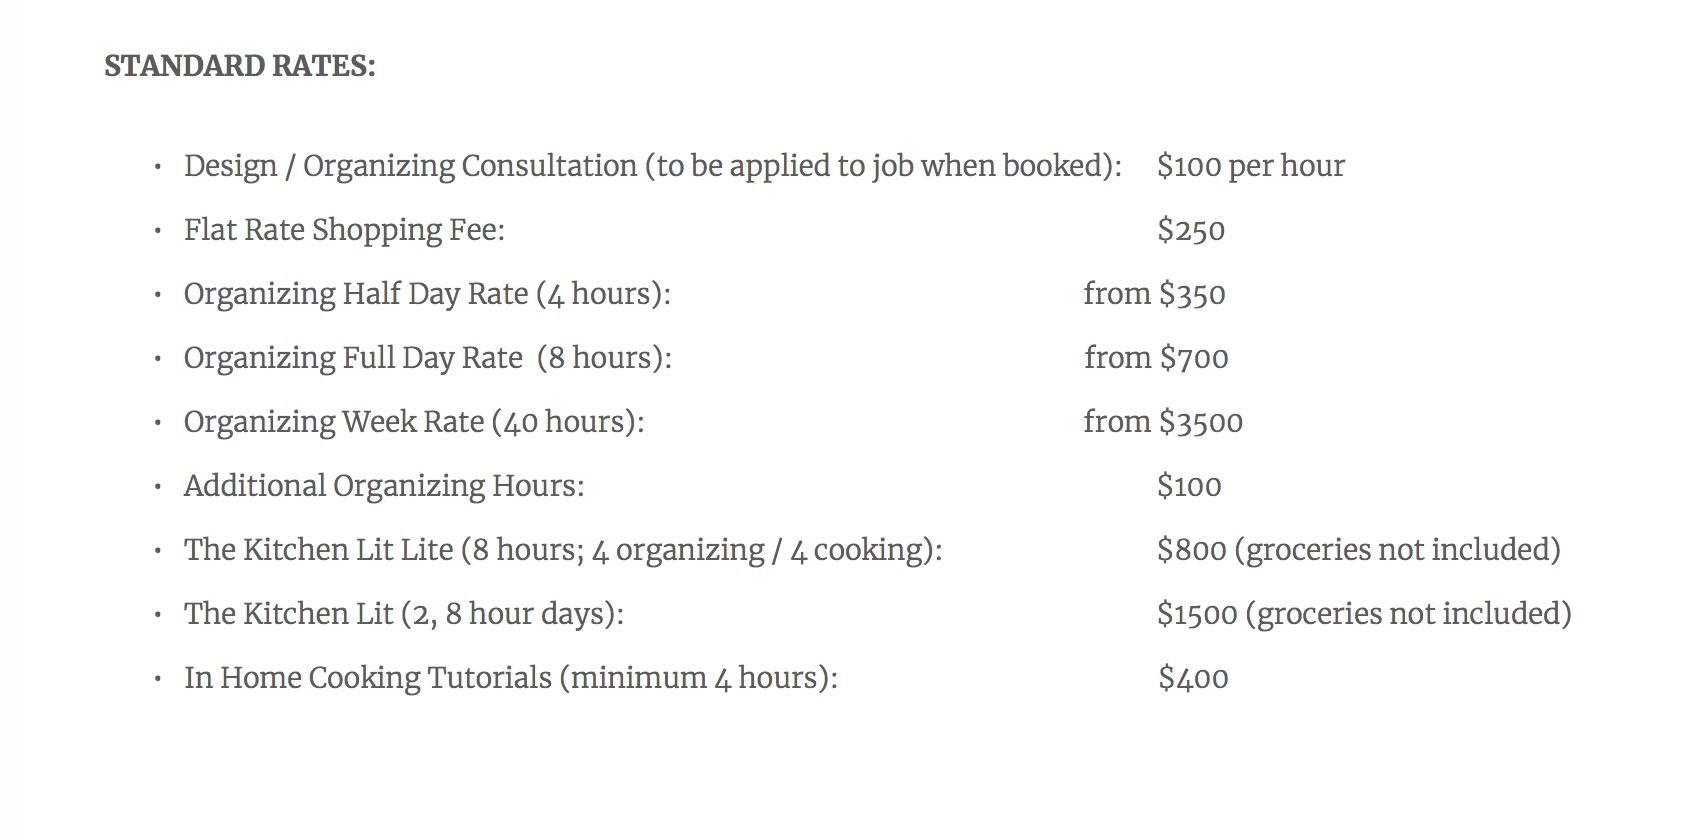 Standard Rates